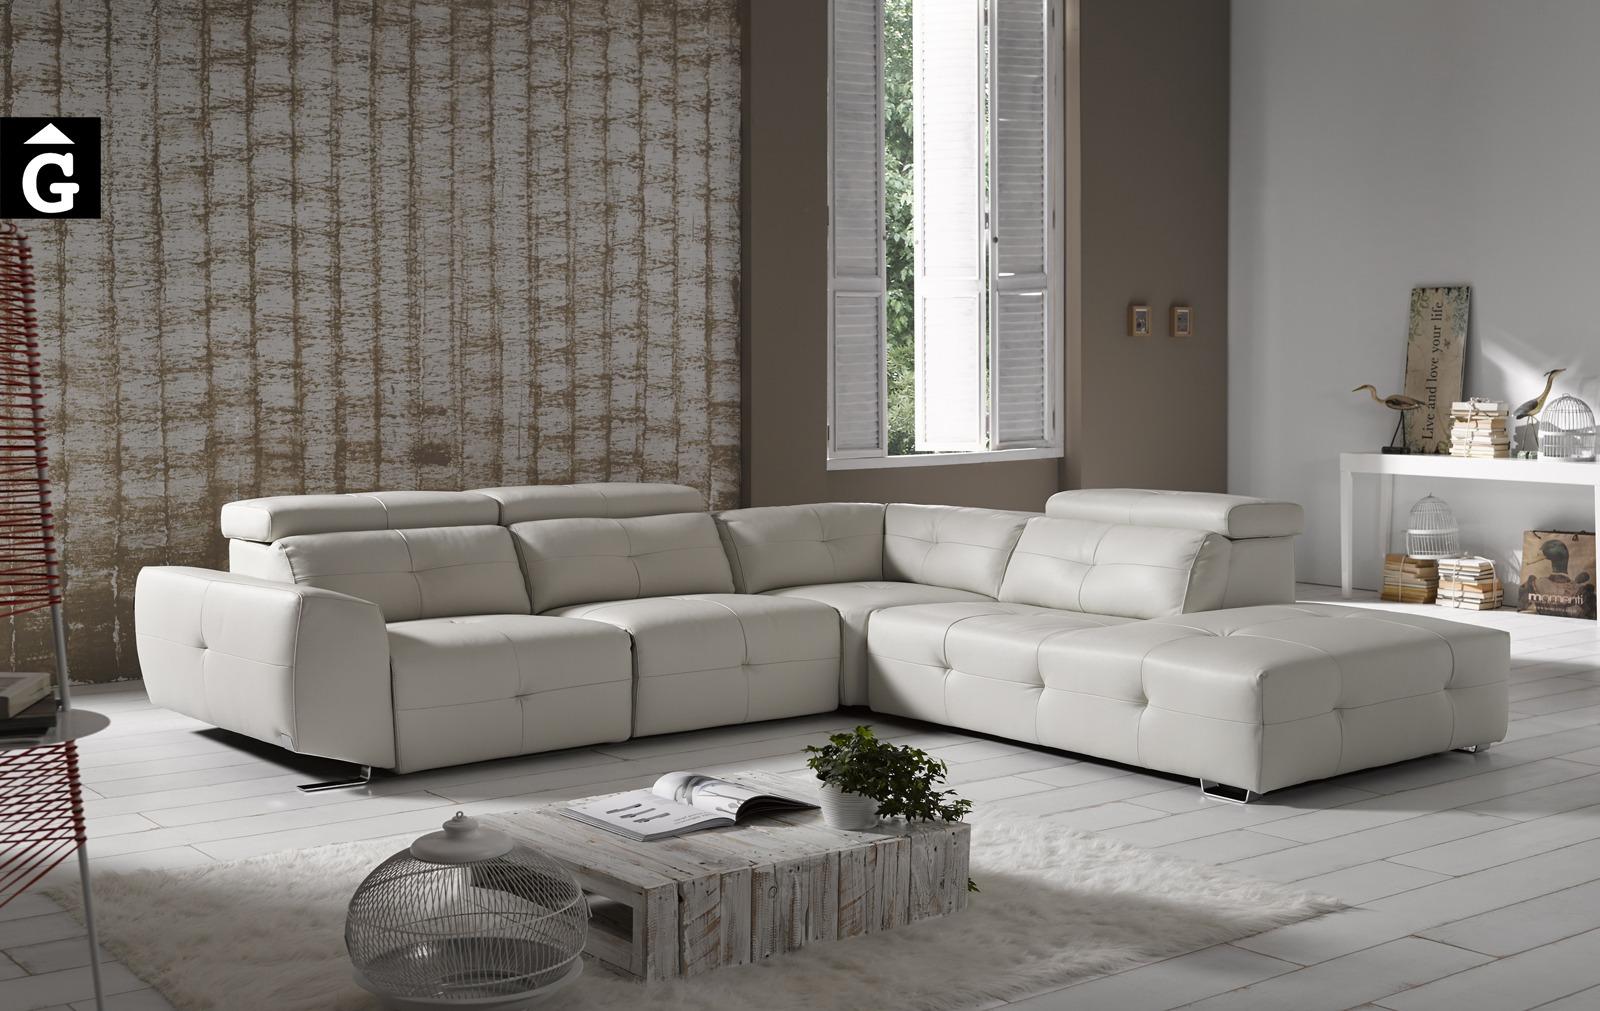 1 Pedro Ortiz tapisseria by mobles Gifreu sofas relax